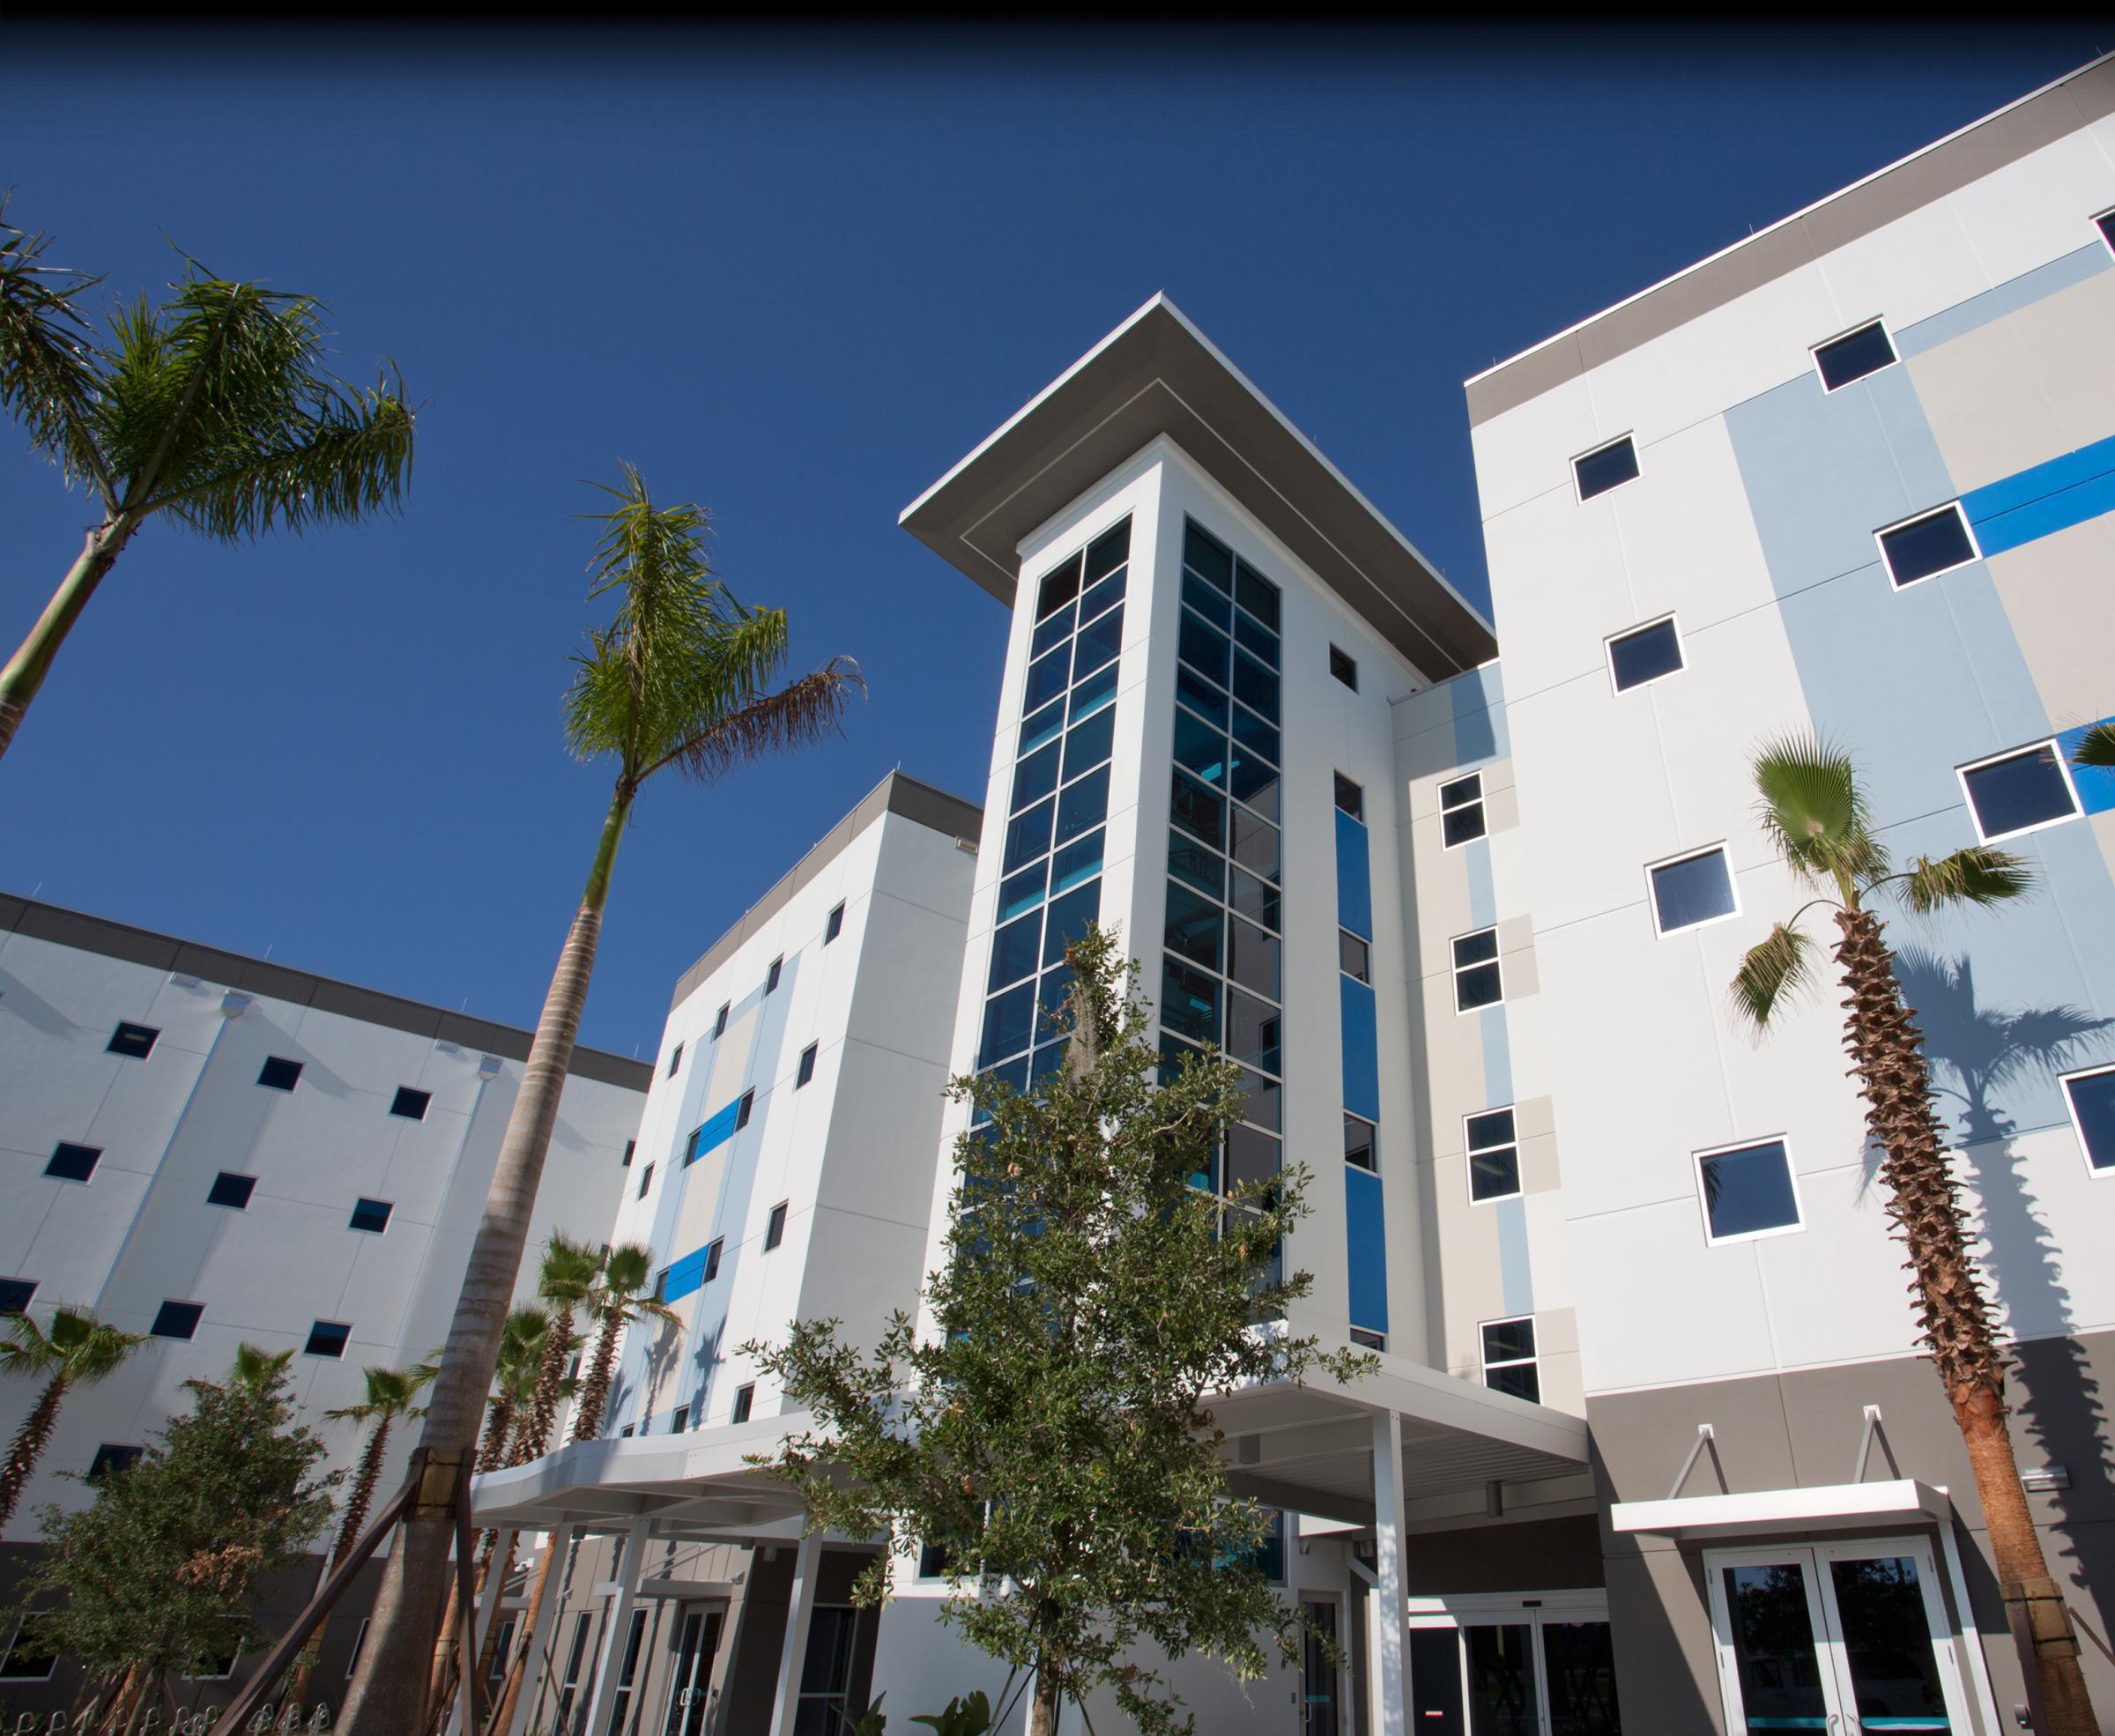 Img Academy Student Residence Hall 5 Story Tandem